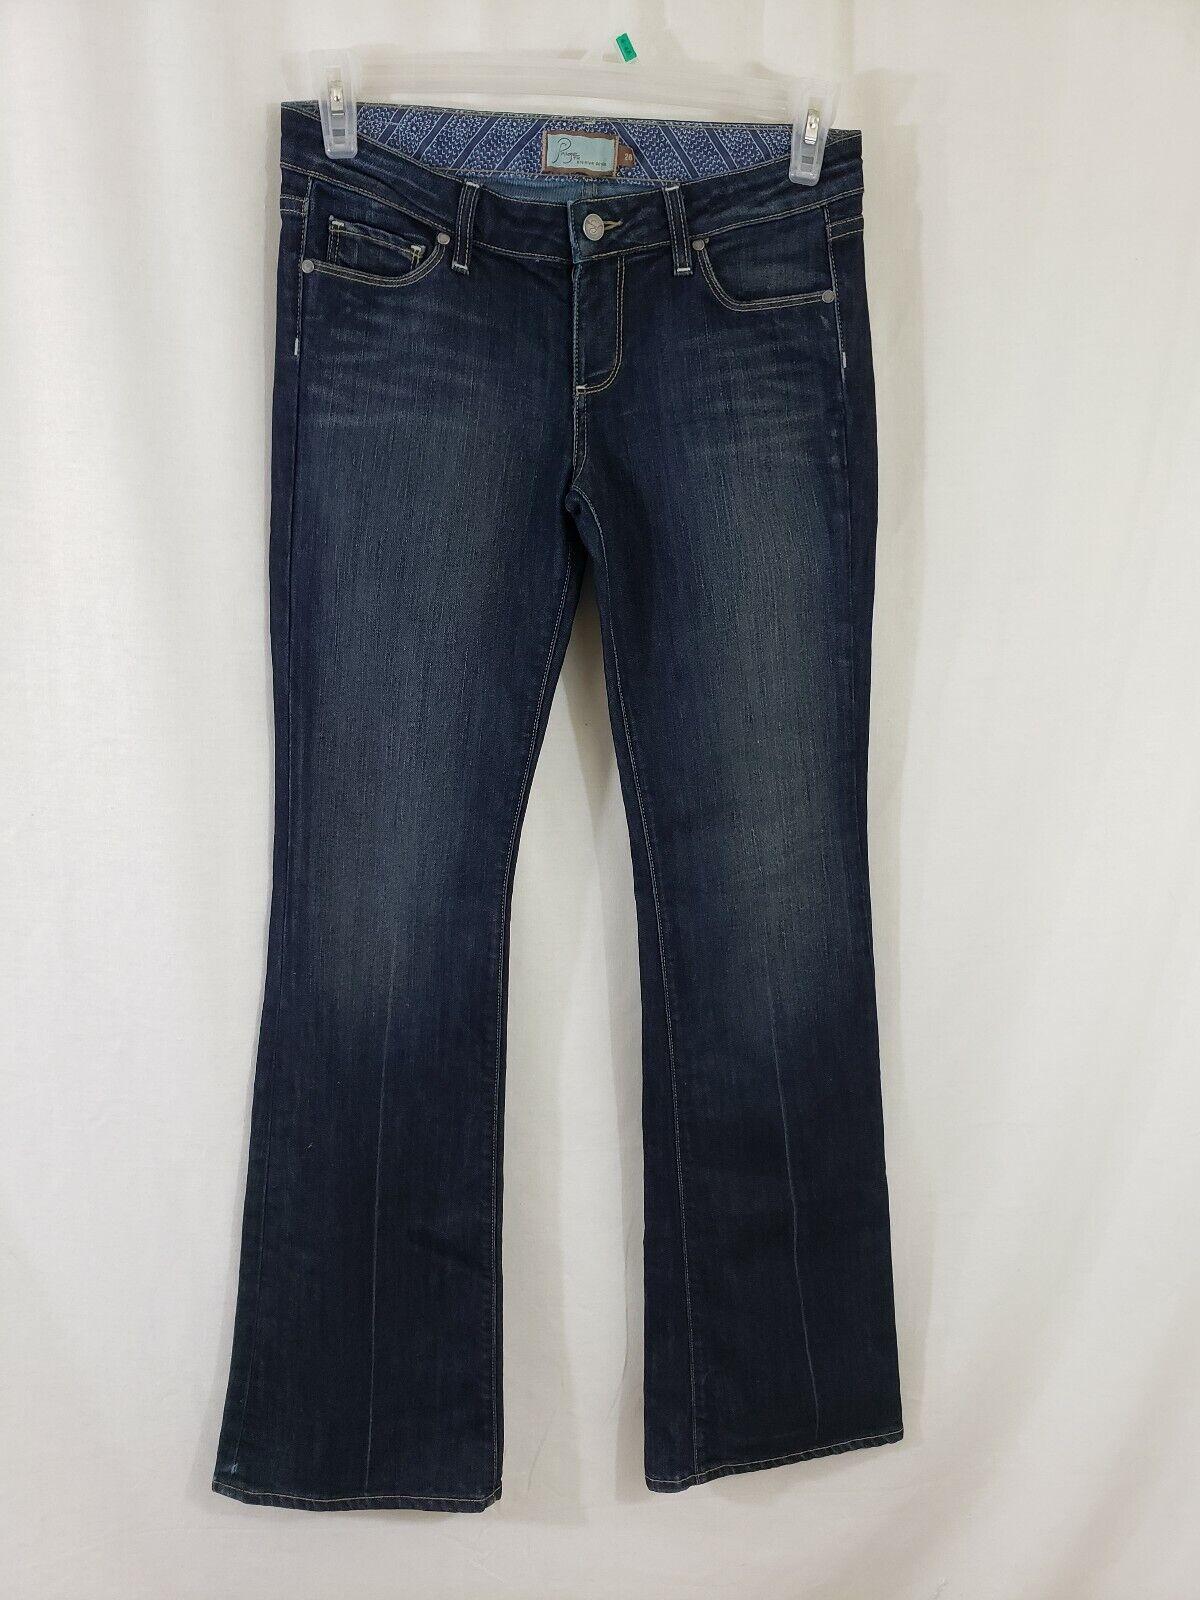 Paige Laurel Canyon Womens Denim bluee Jeans Size 28 x 34 Boot Cut Dark Wash low